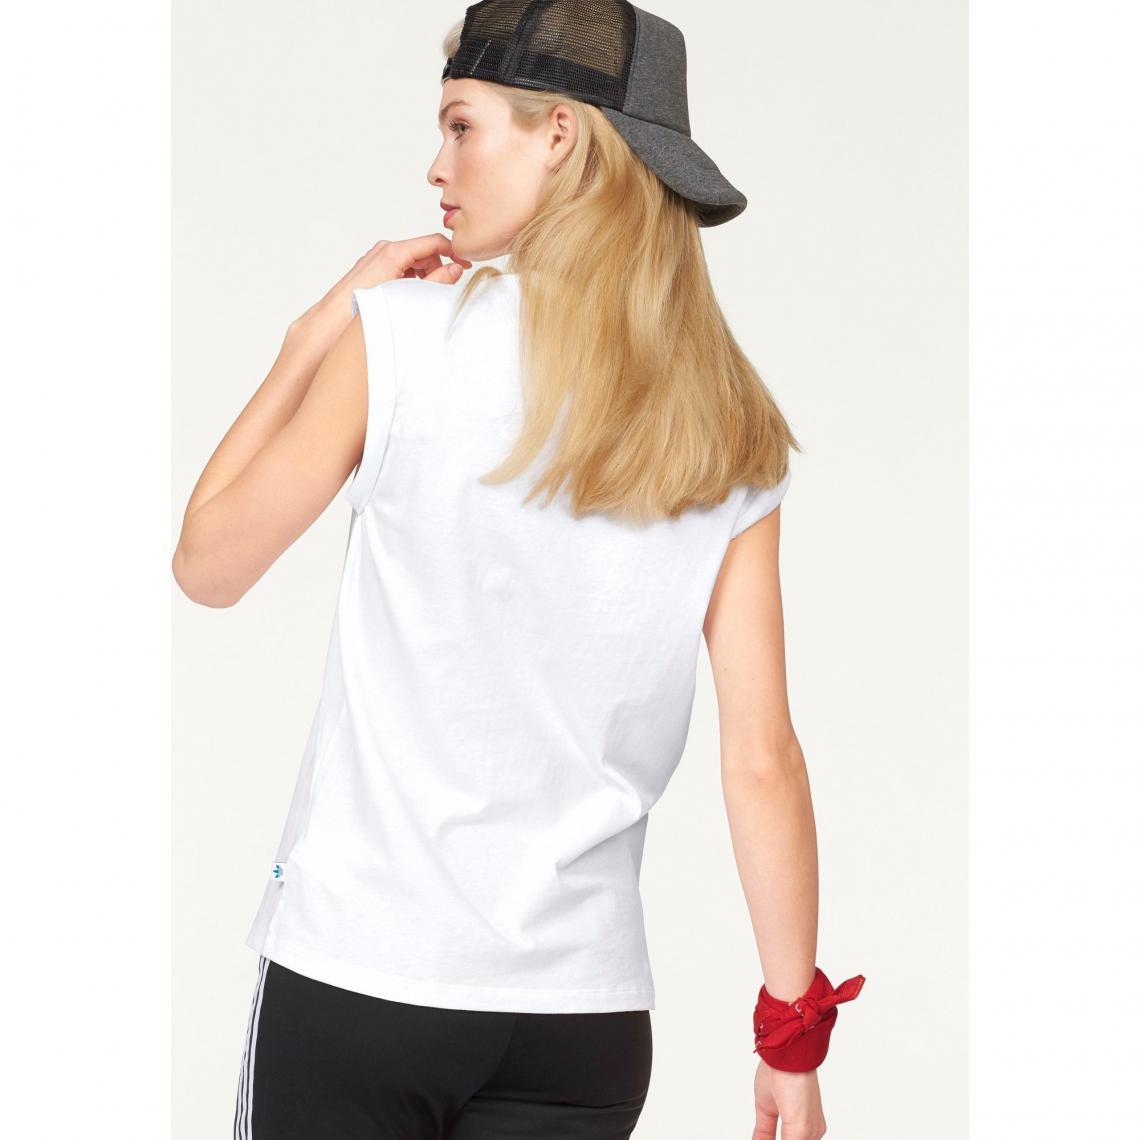 Tee-shirt femme Bf Trefoil Roll up Tee adidas Originals - Blanc  51b010497f6